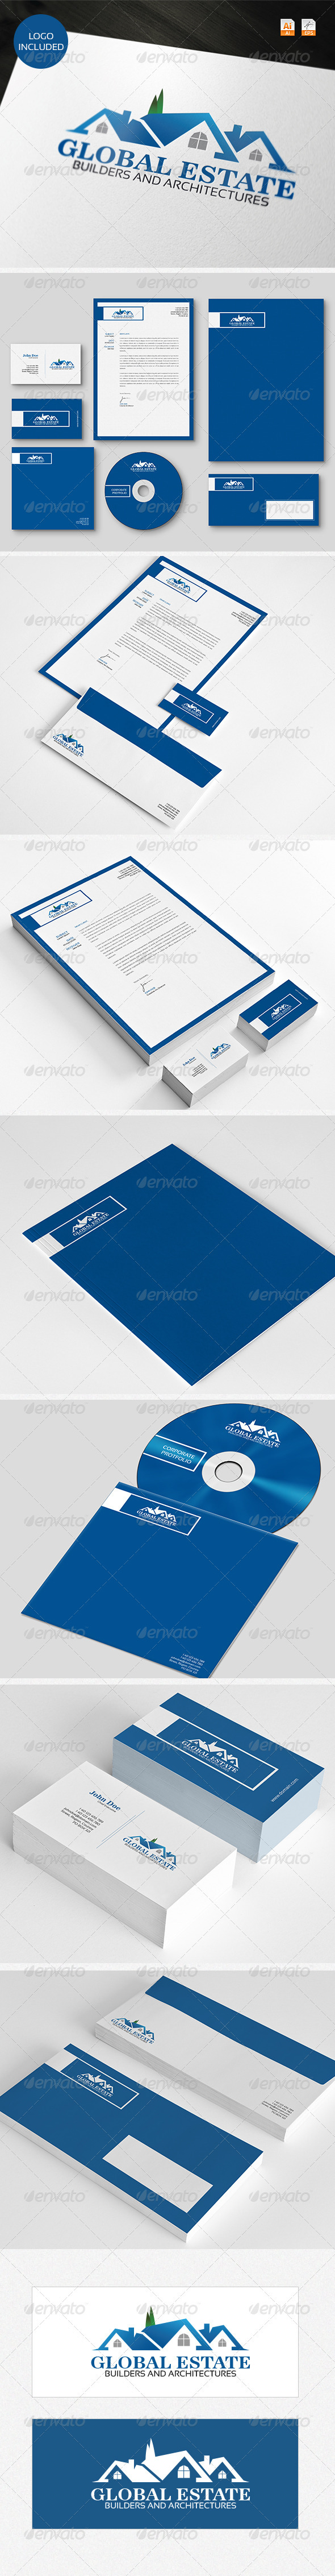 GraphicRiver Global Estate Logo & Identity 3761120